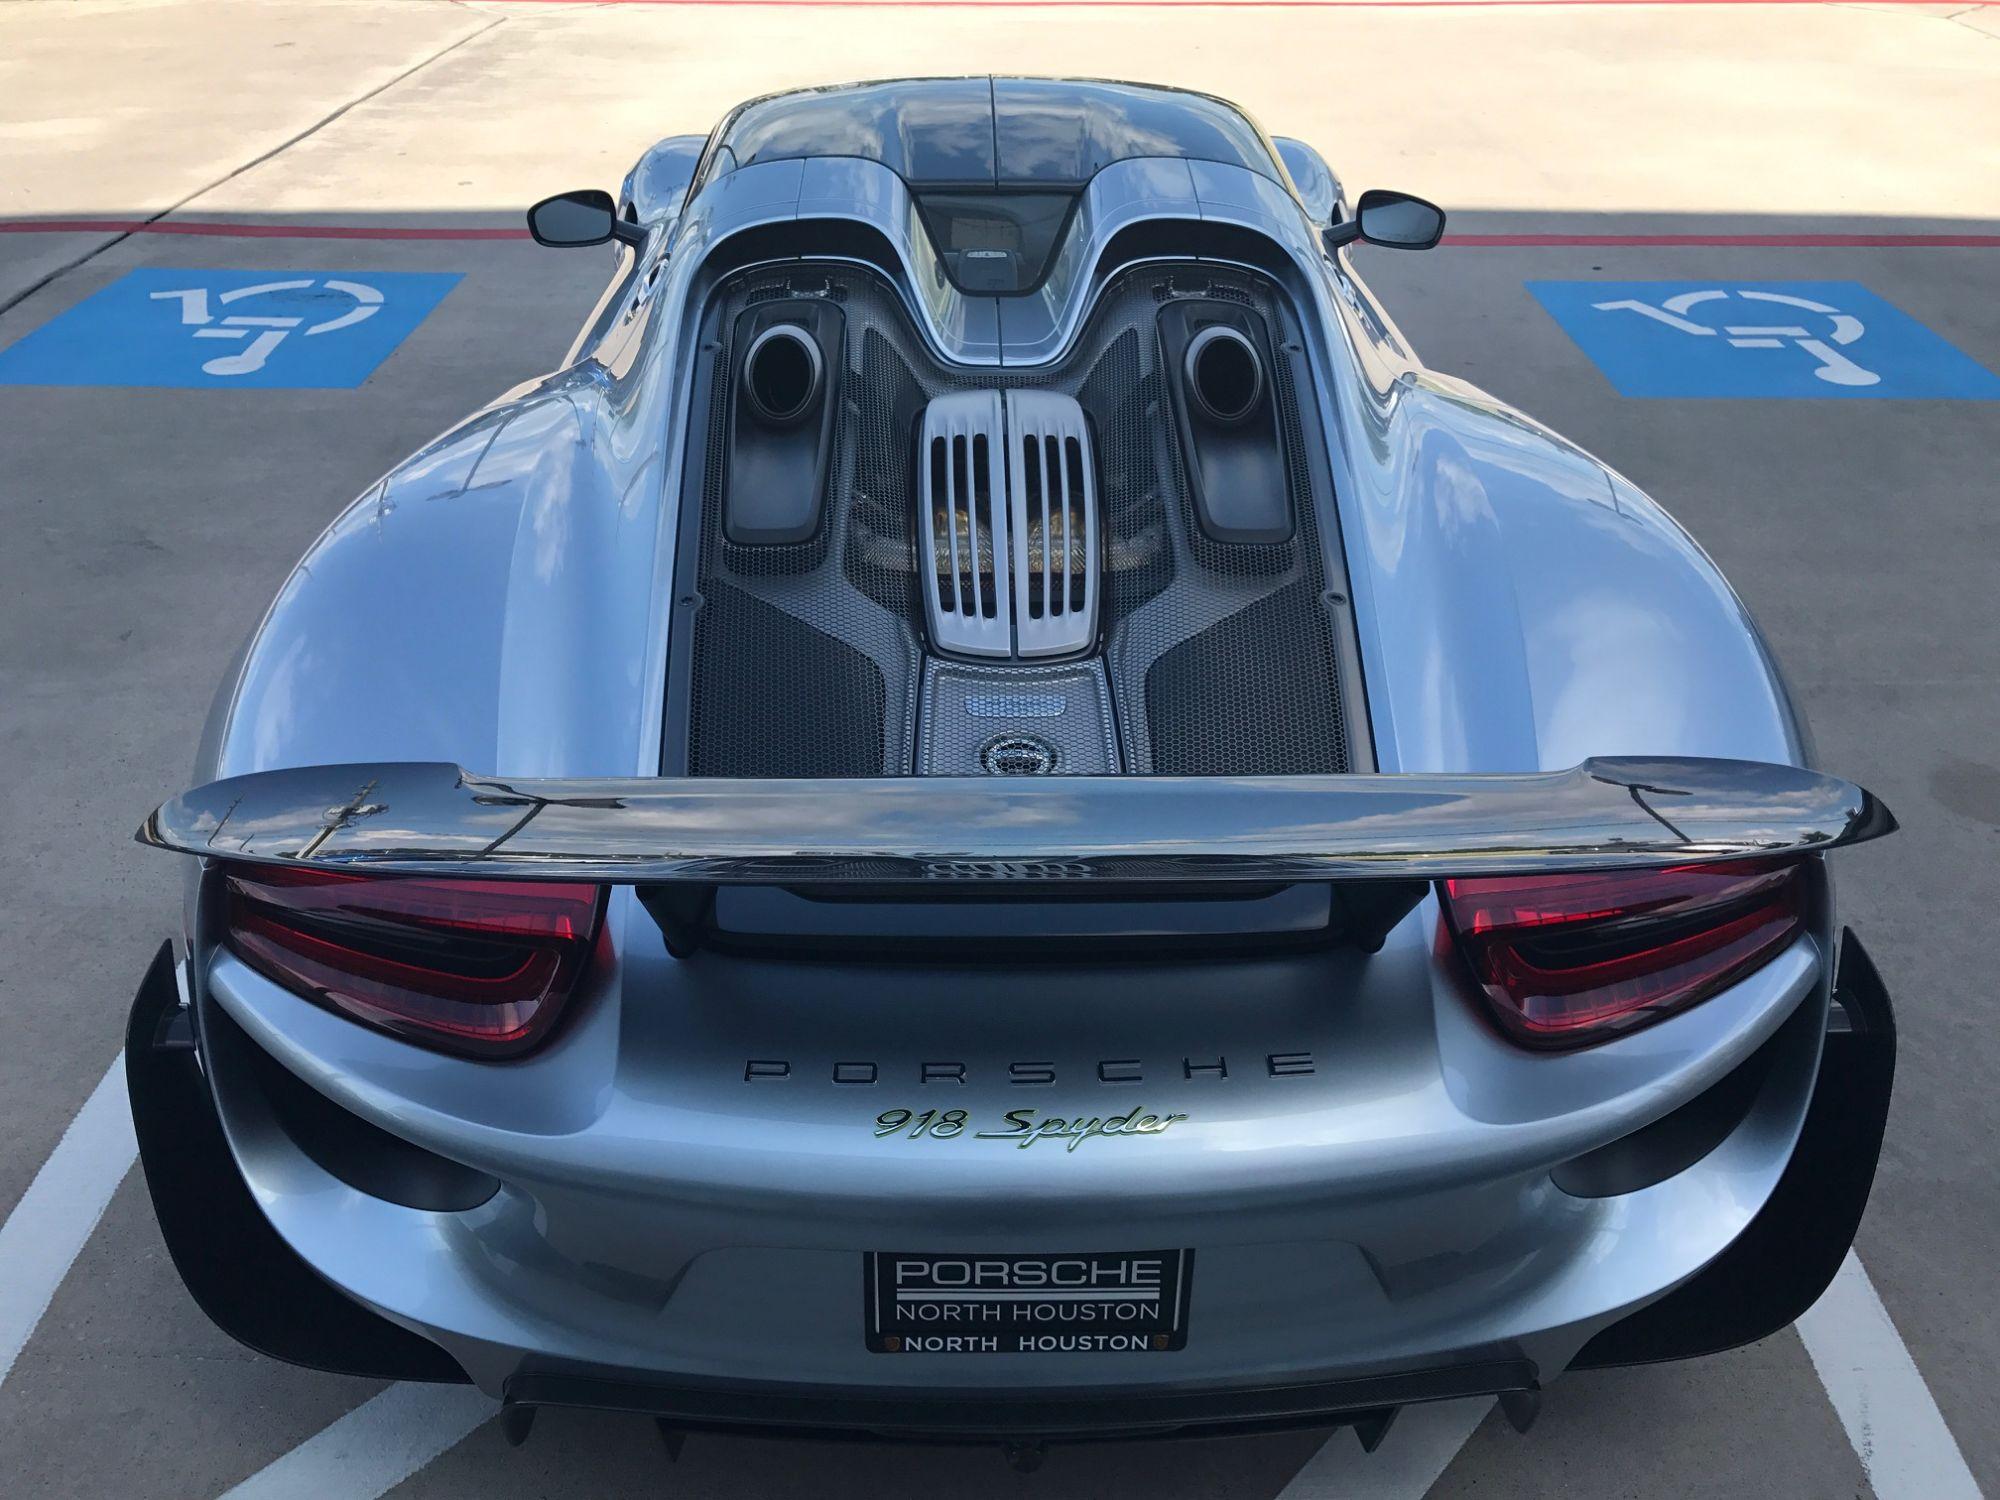 message-editor%2F1497472880454-img_9718_7b12865a635ae2ce9b80a960d18aa46336503ac8 Amazing Porsche 918 Spyder sold Out Cars Trend